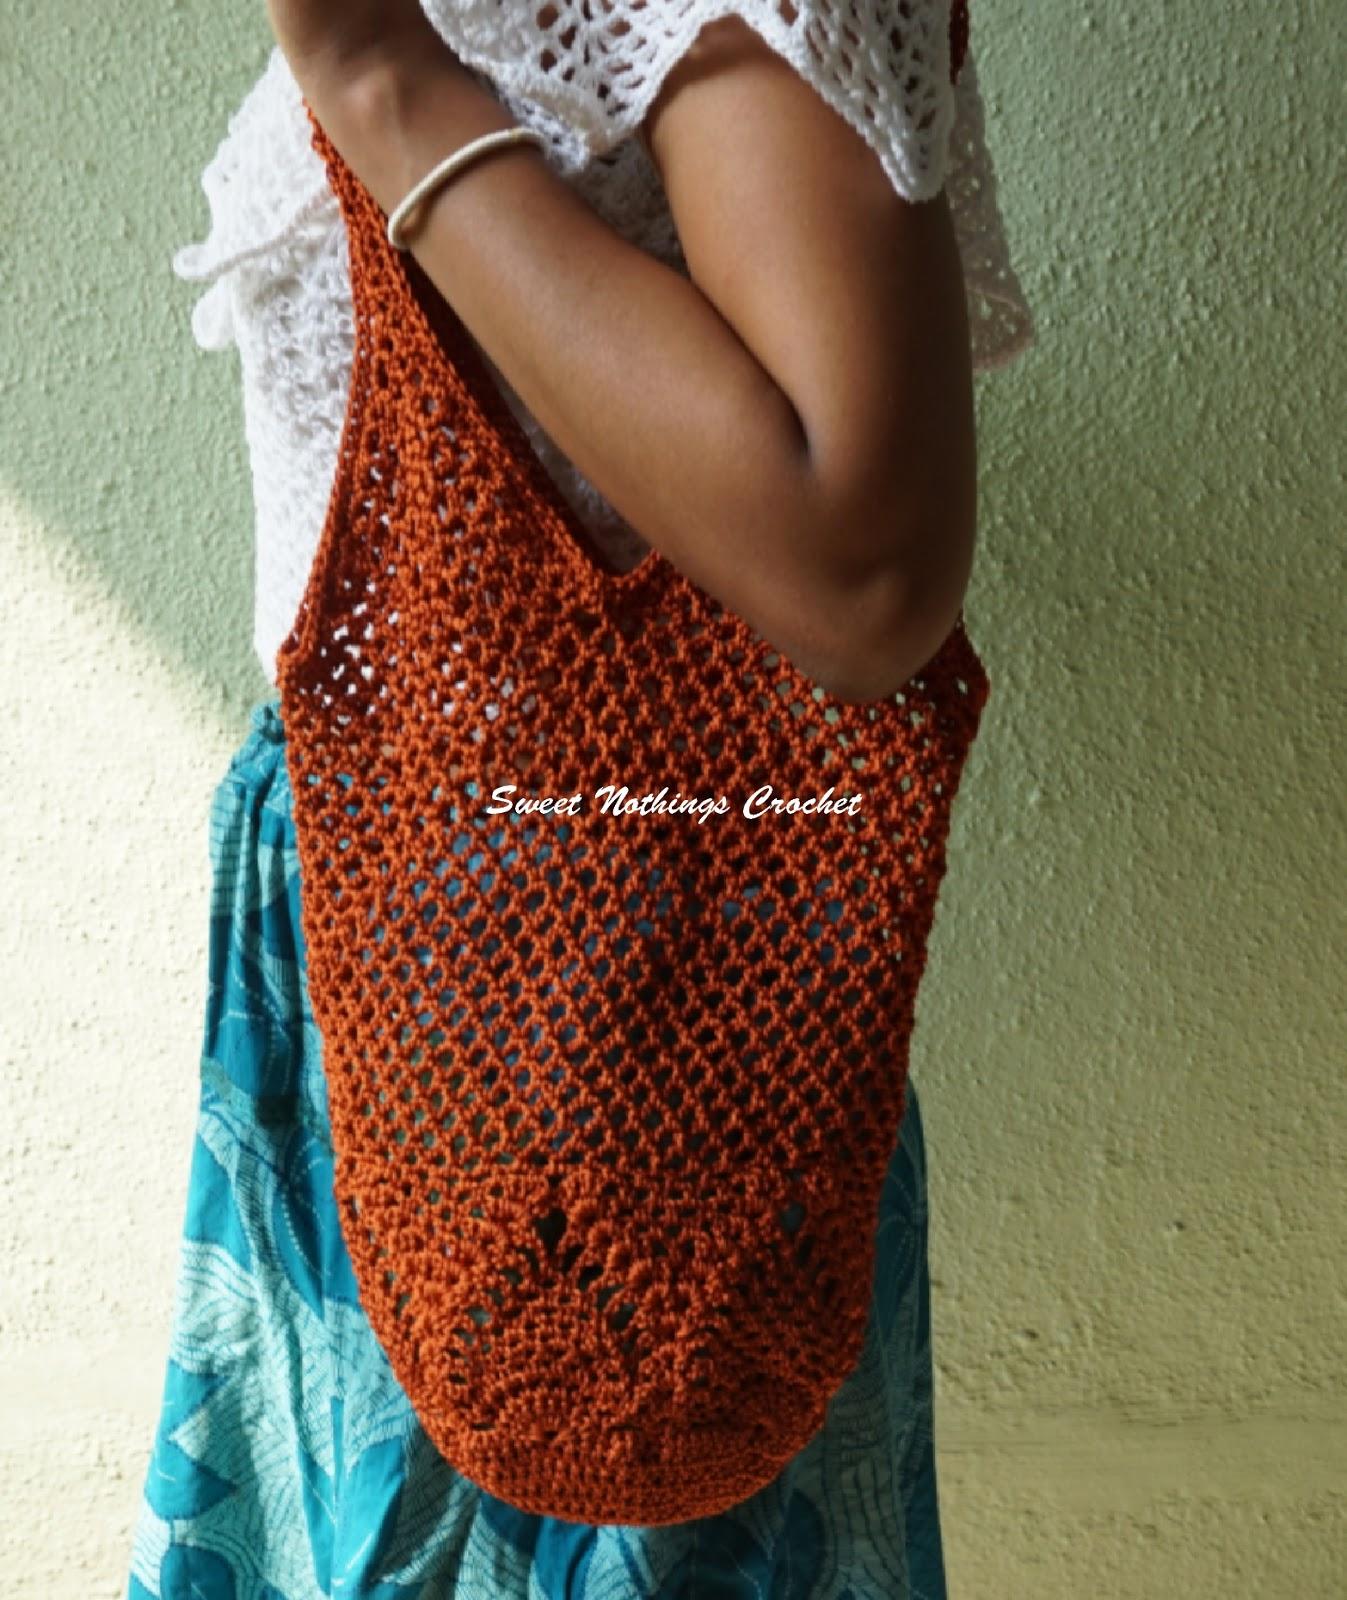 Sweet Nothings Crochet: PINEAPPLE BOHO BEACH BAG